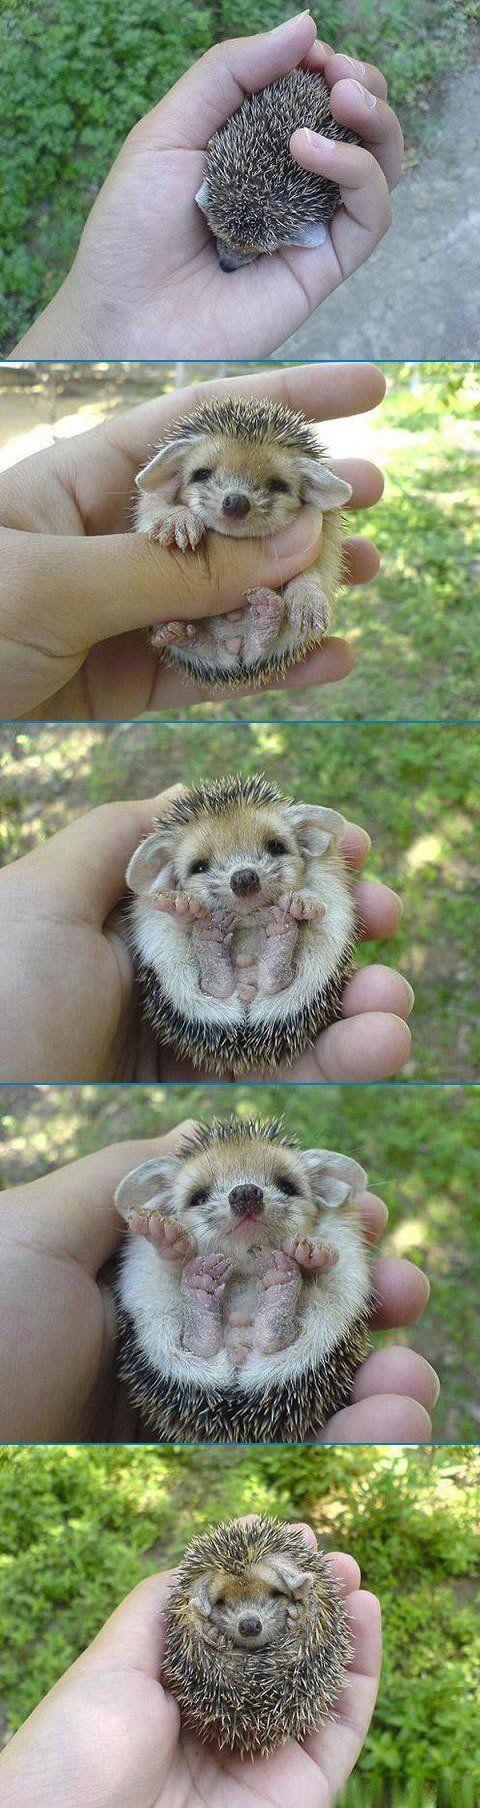 baby hedgehogggg